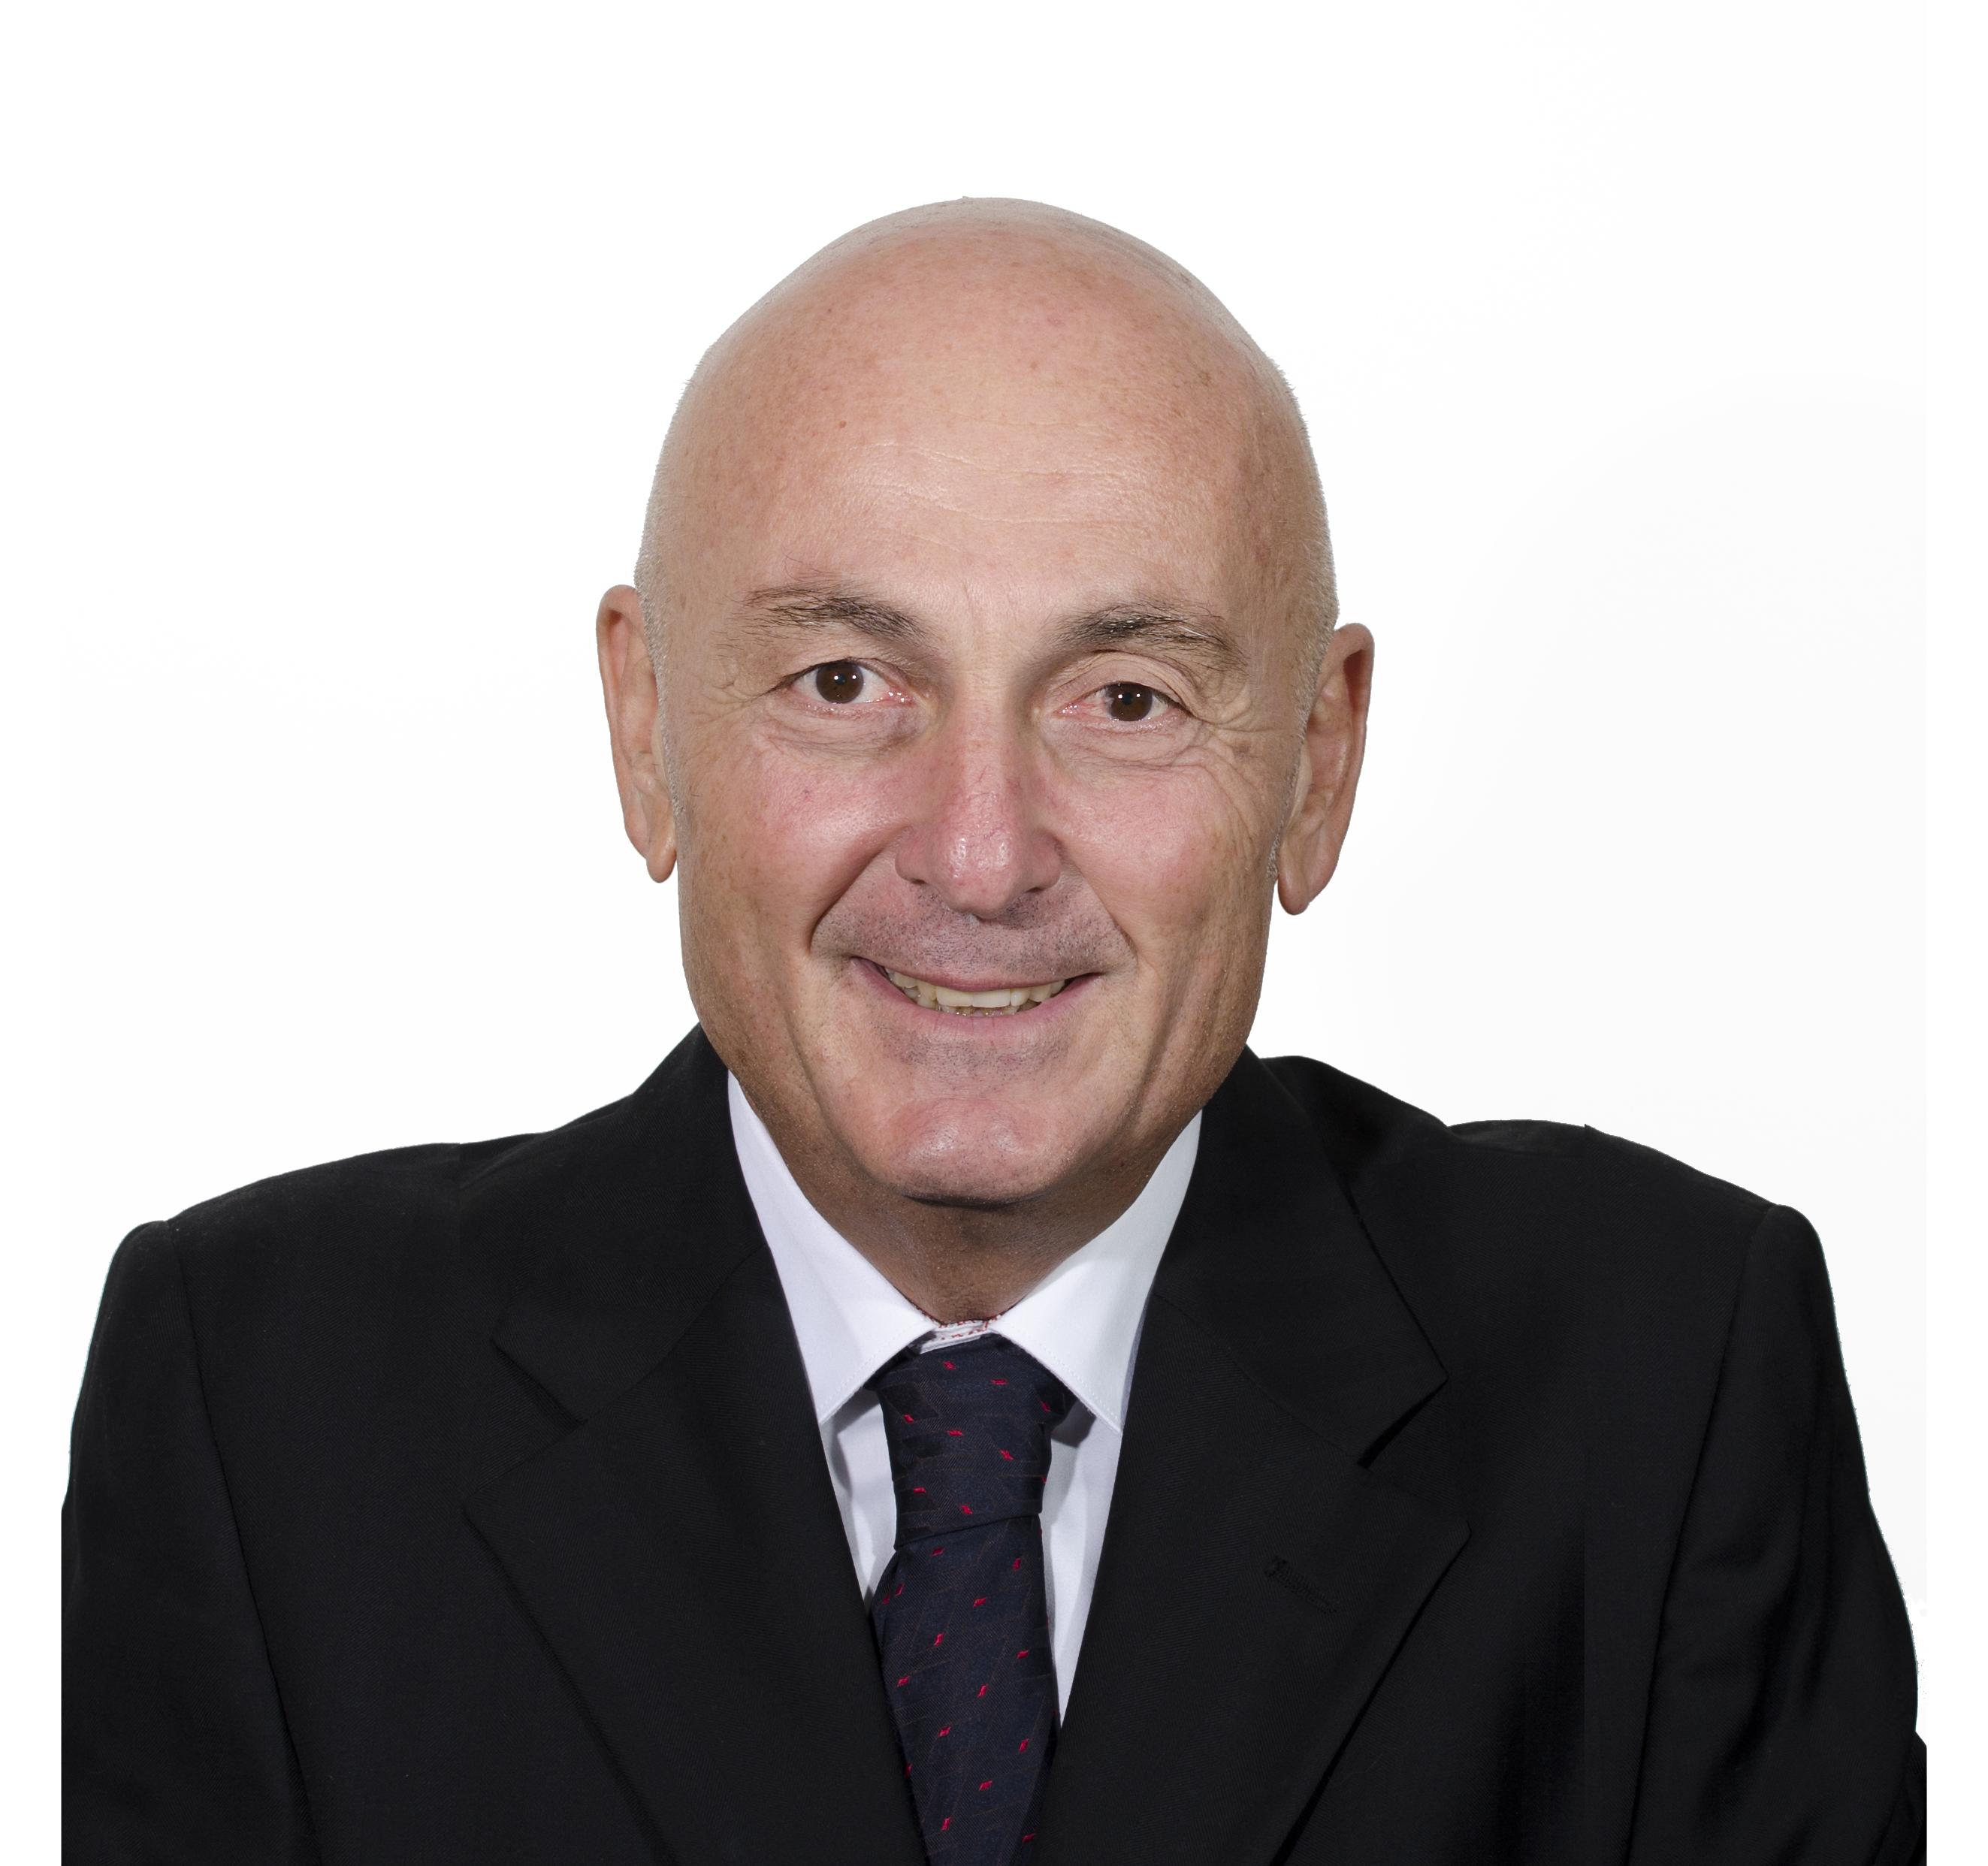 Jacob Luxenburg, Chairman